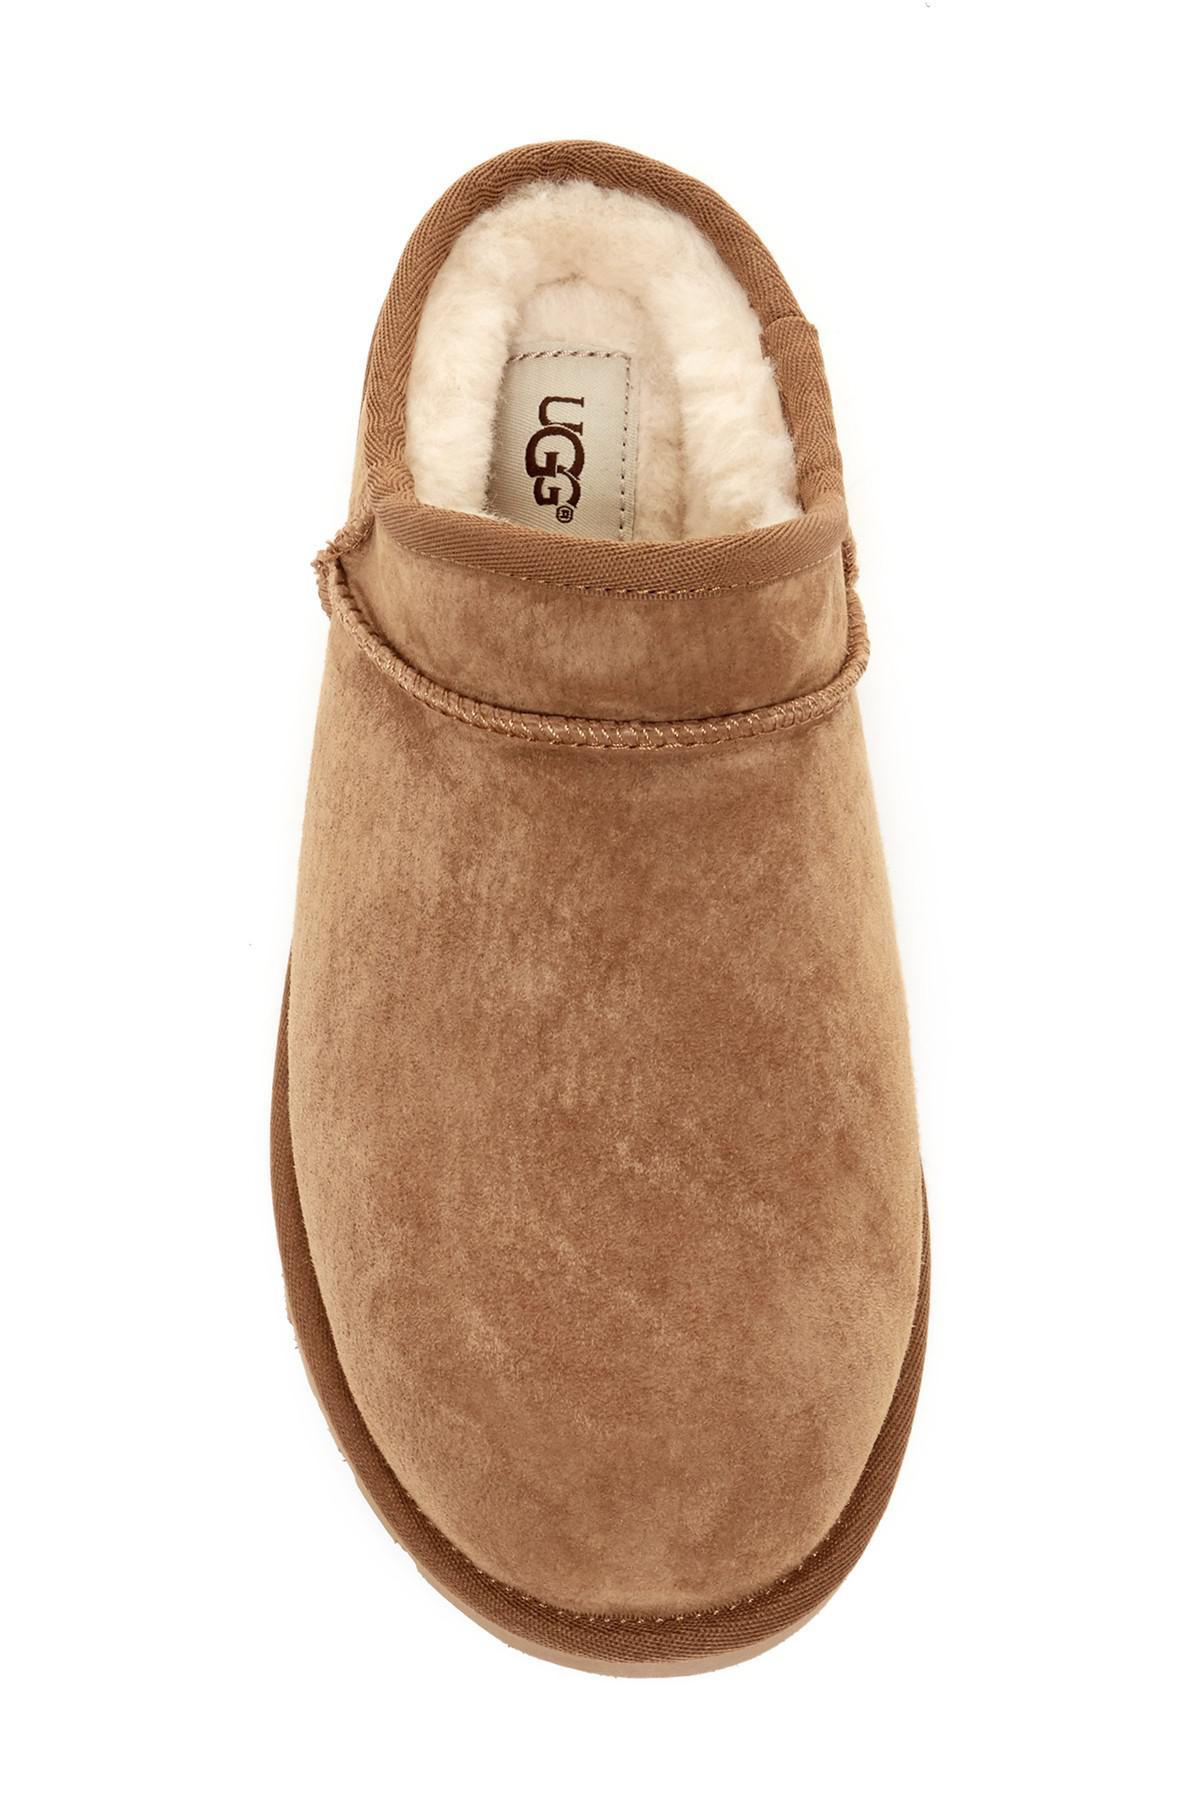 50dd017364474 Ugg - Brown (r) Classic Water Resistant Slipper (women) - Lyst. View  fullscreen